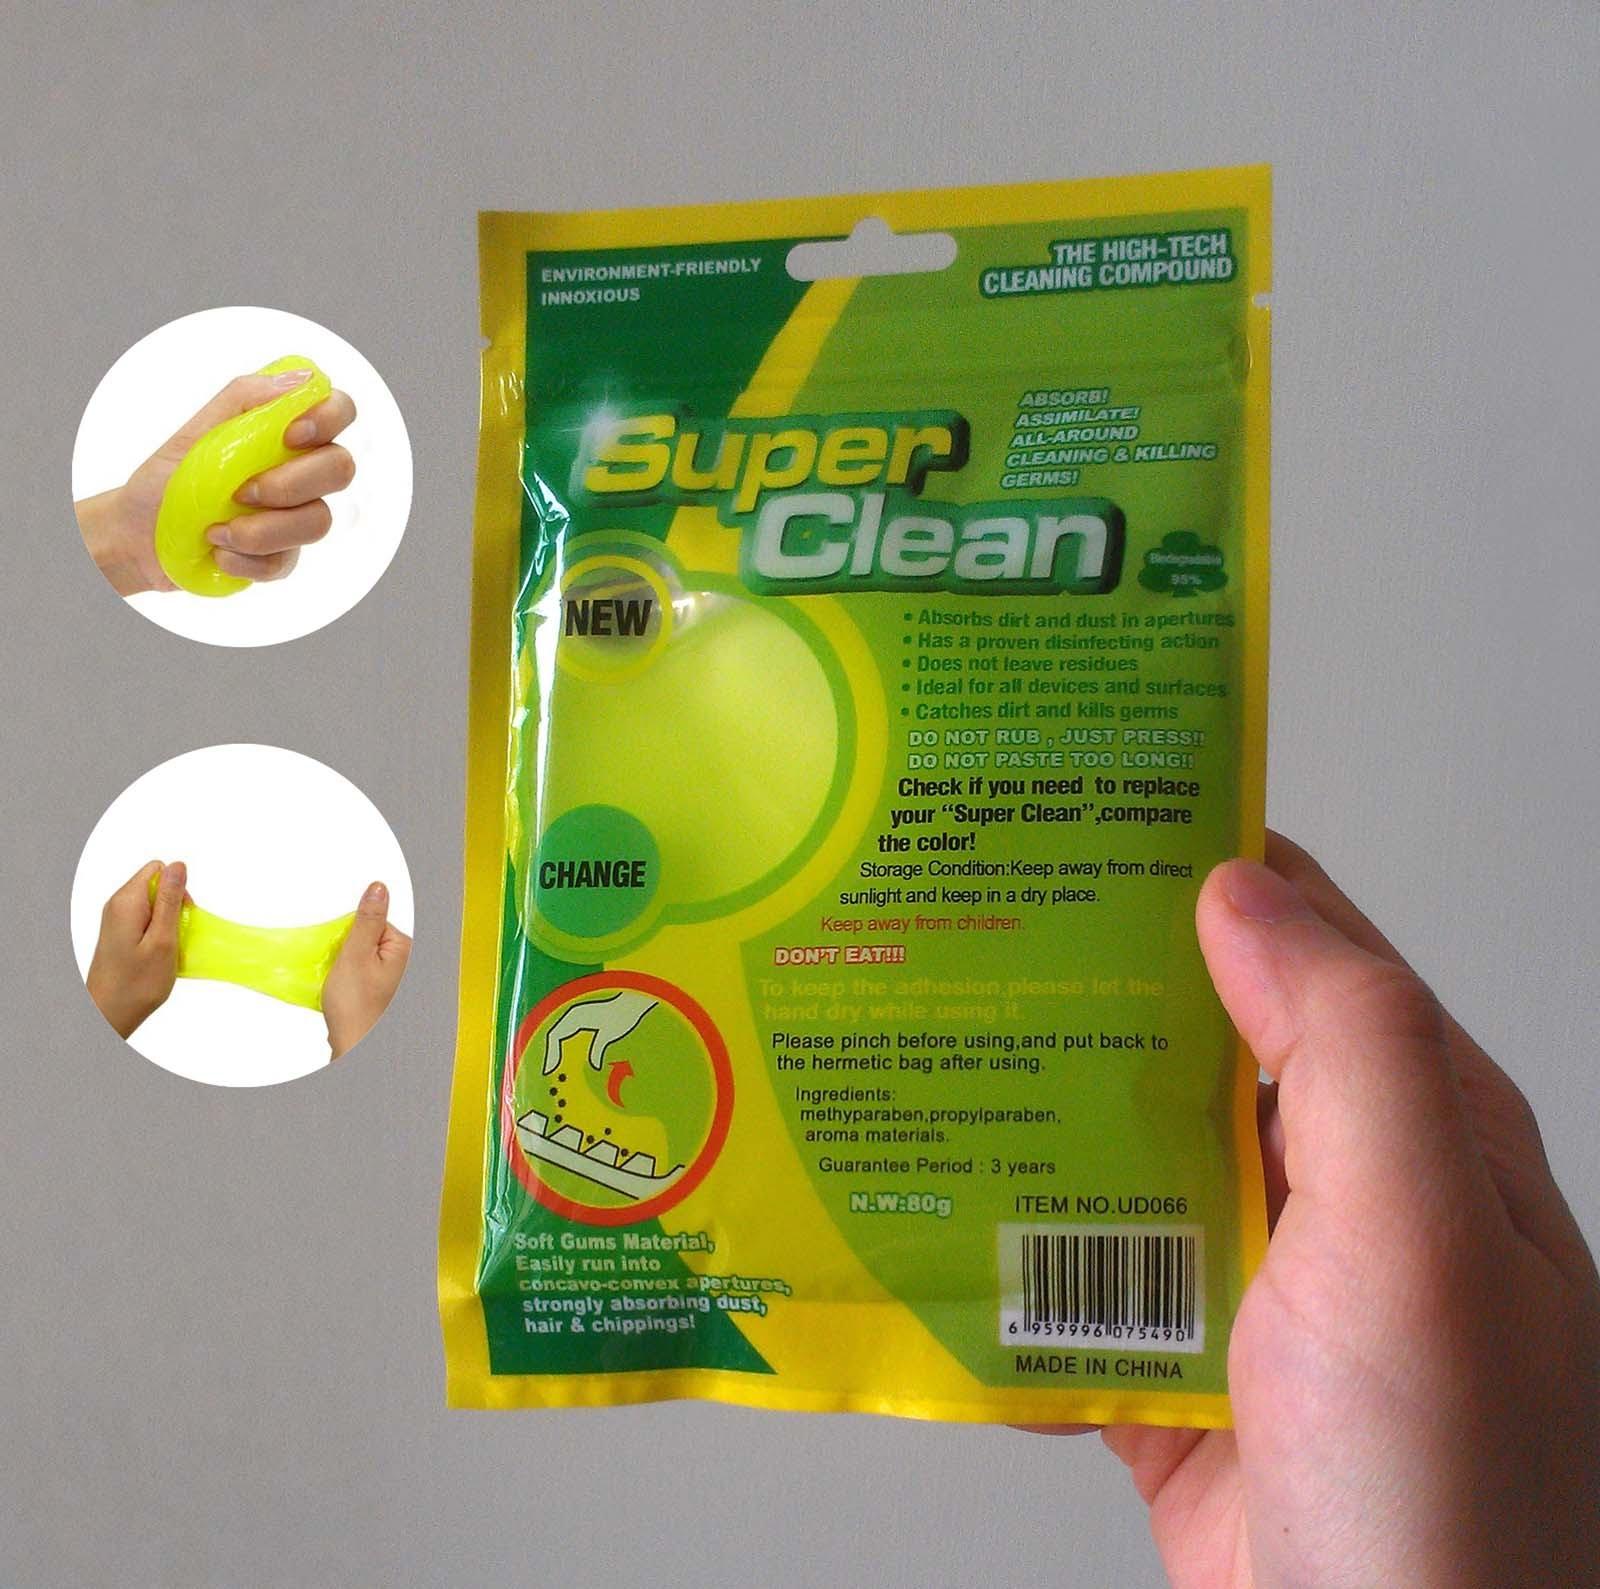 SUPER CLEAN 多用途清潔軟膠 / 除塵軟膠 / 神奇鍵盤清潔膠 / 神奇清潔膠 哪裡買 / 清潔鍵盤的 軟膠 / 鍵盤清潔膠 ...